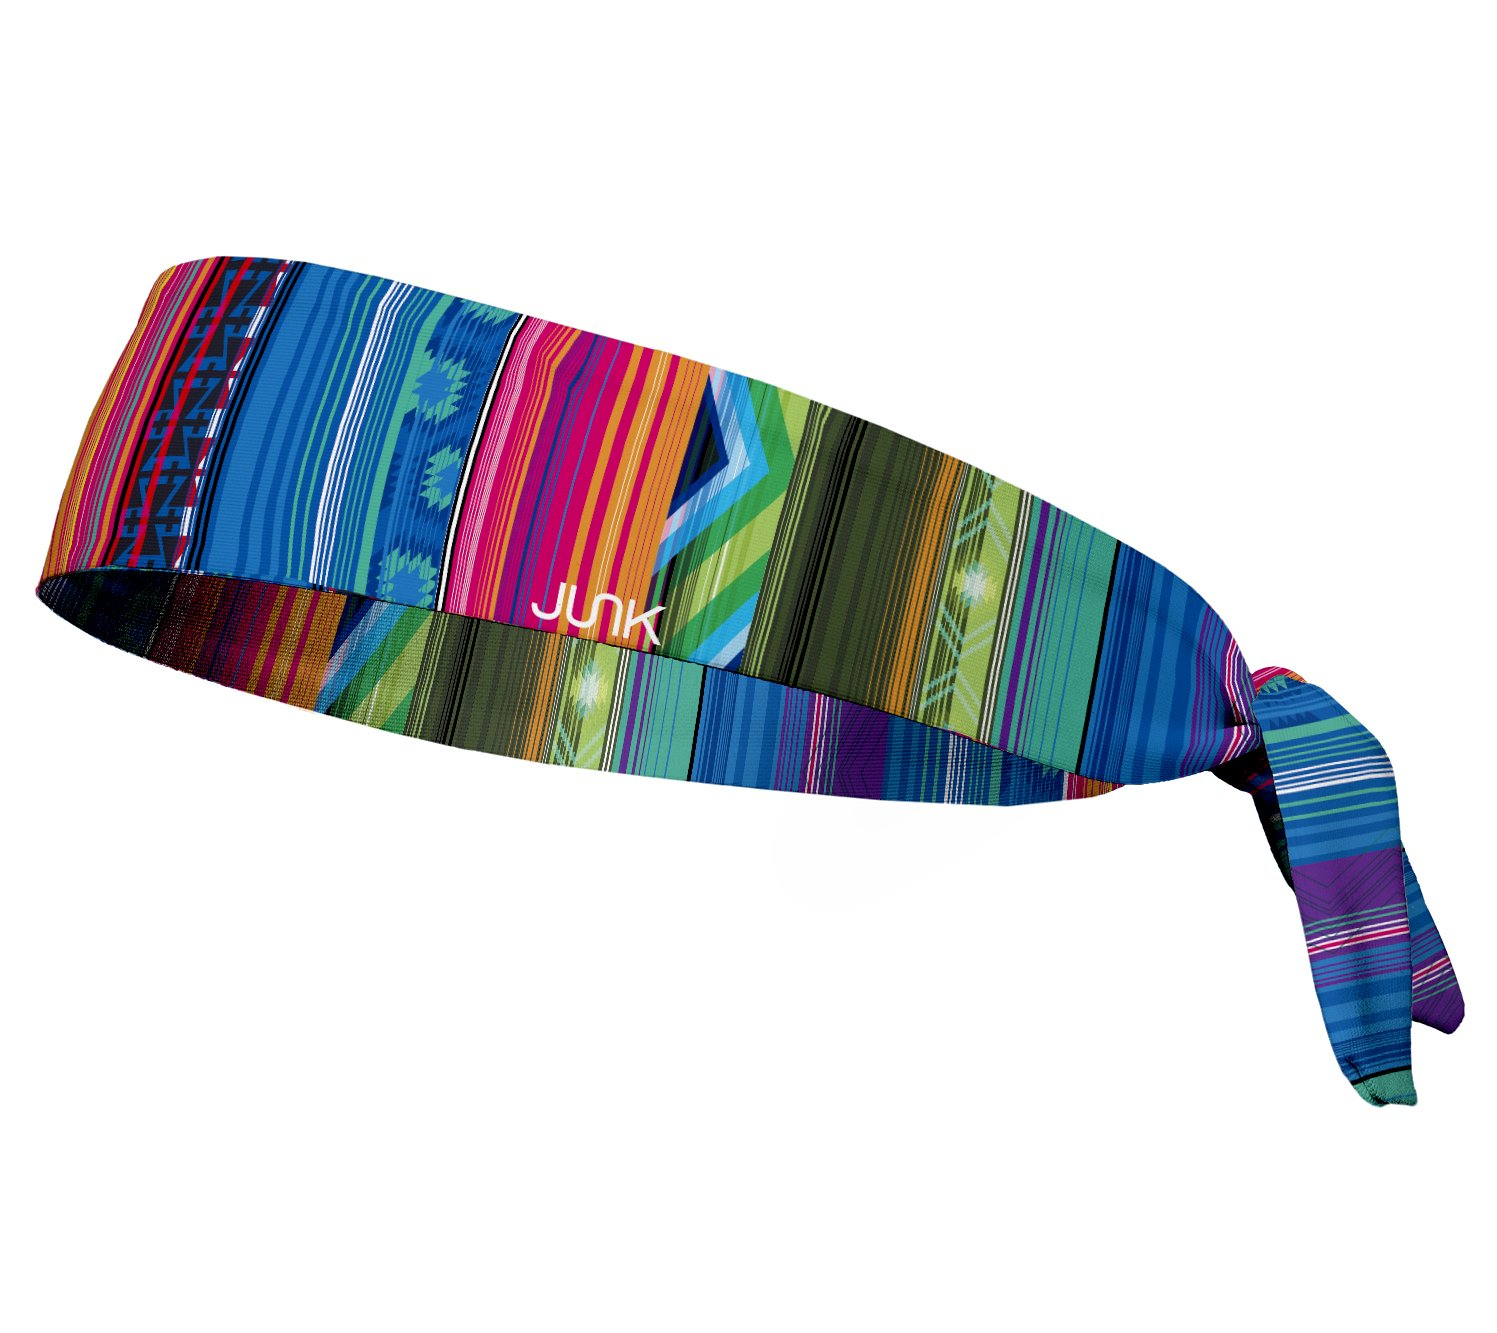 JUNK Brands Flex Tie Headband - Pattern (FT-PATTERN)